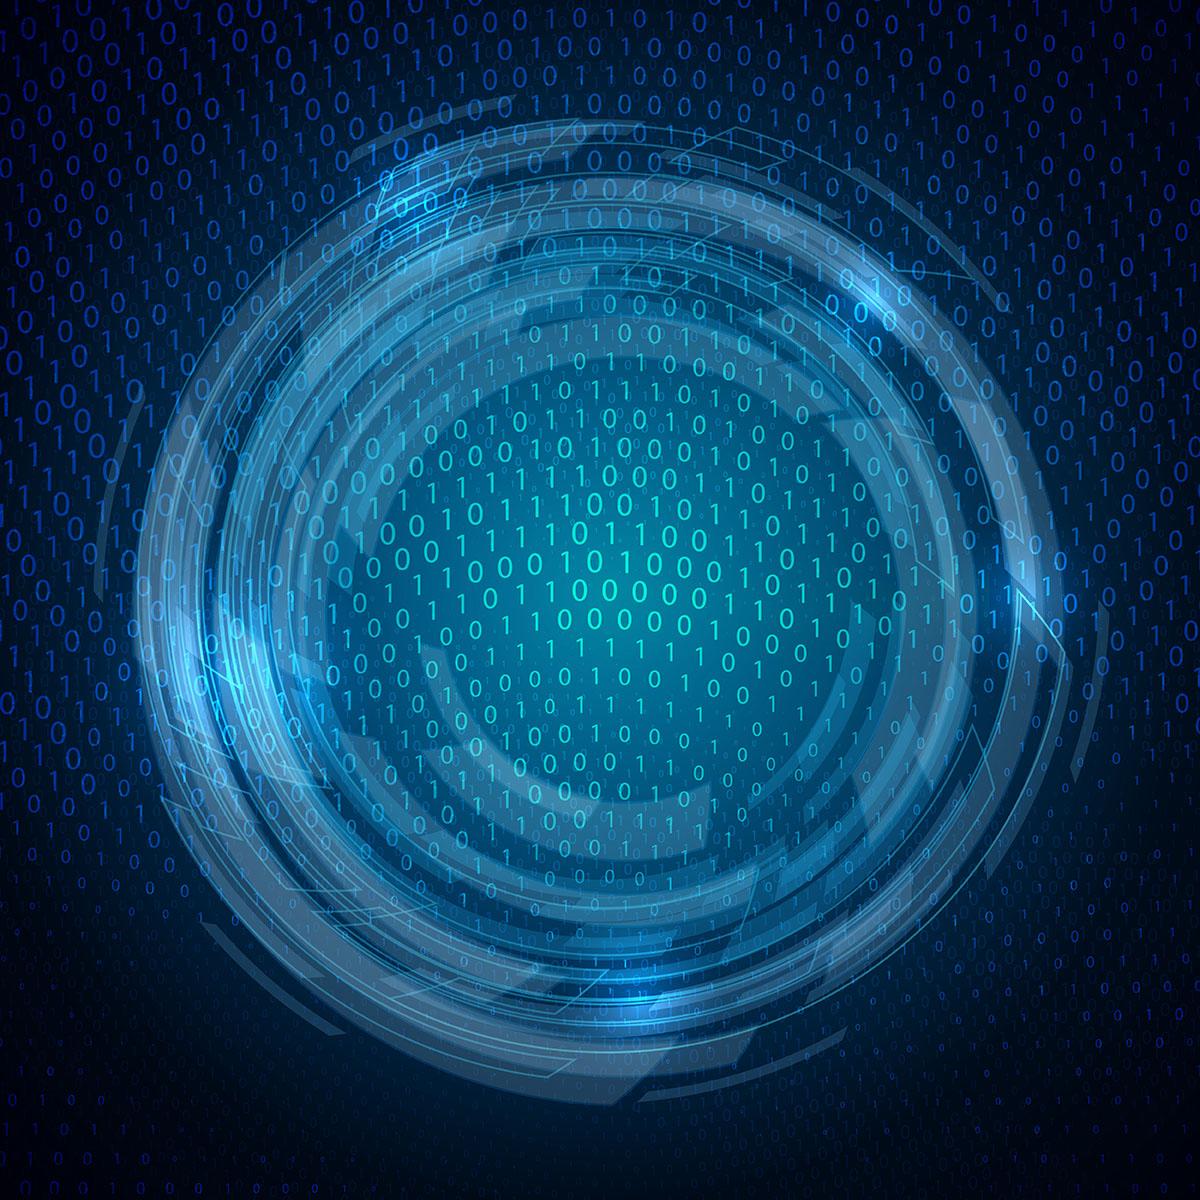 Techno binary code background download free vector art - Binary background gif ...